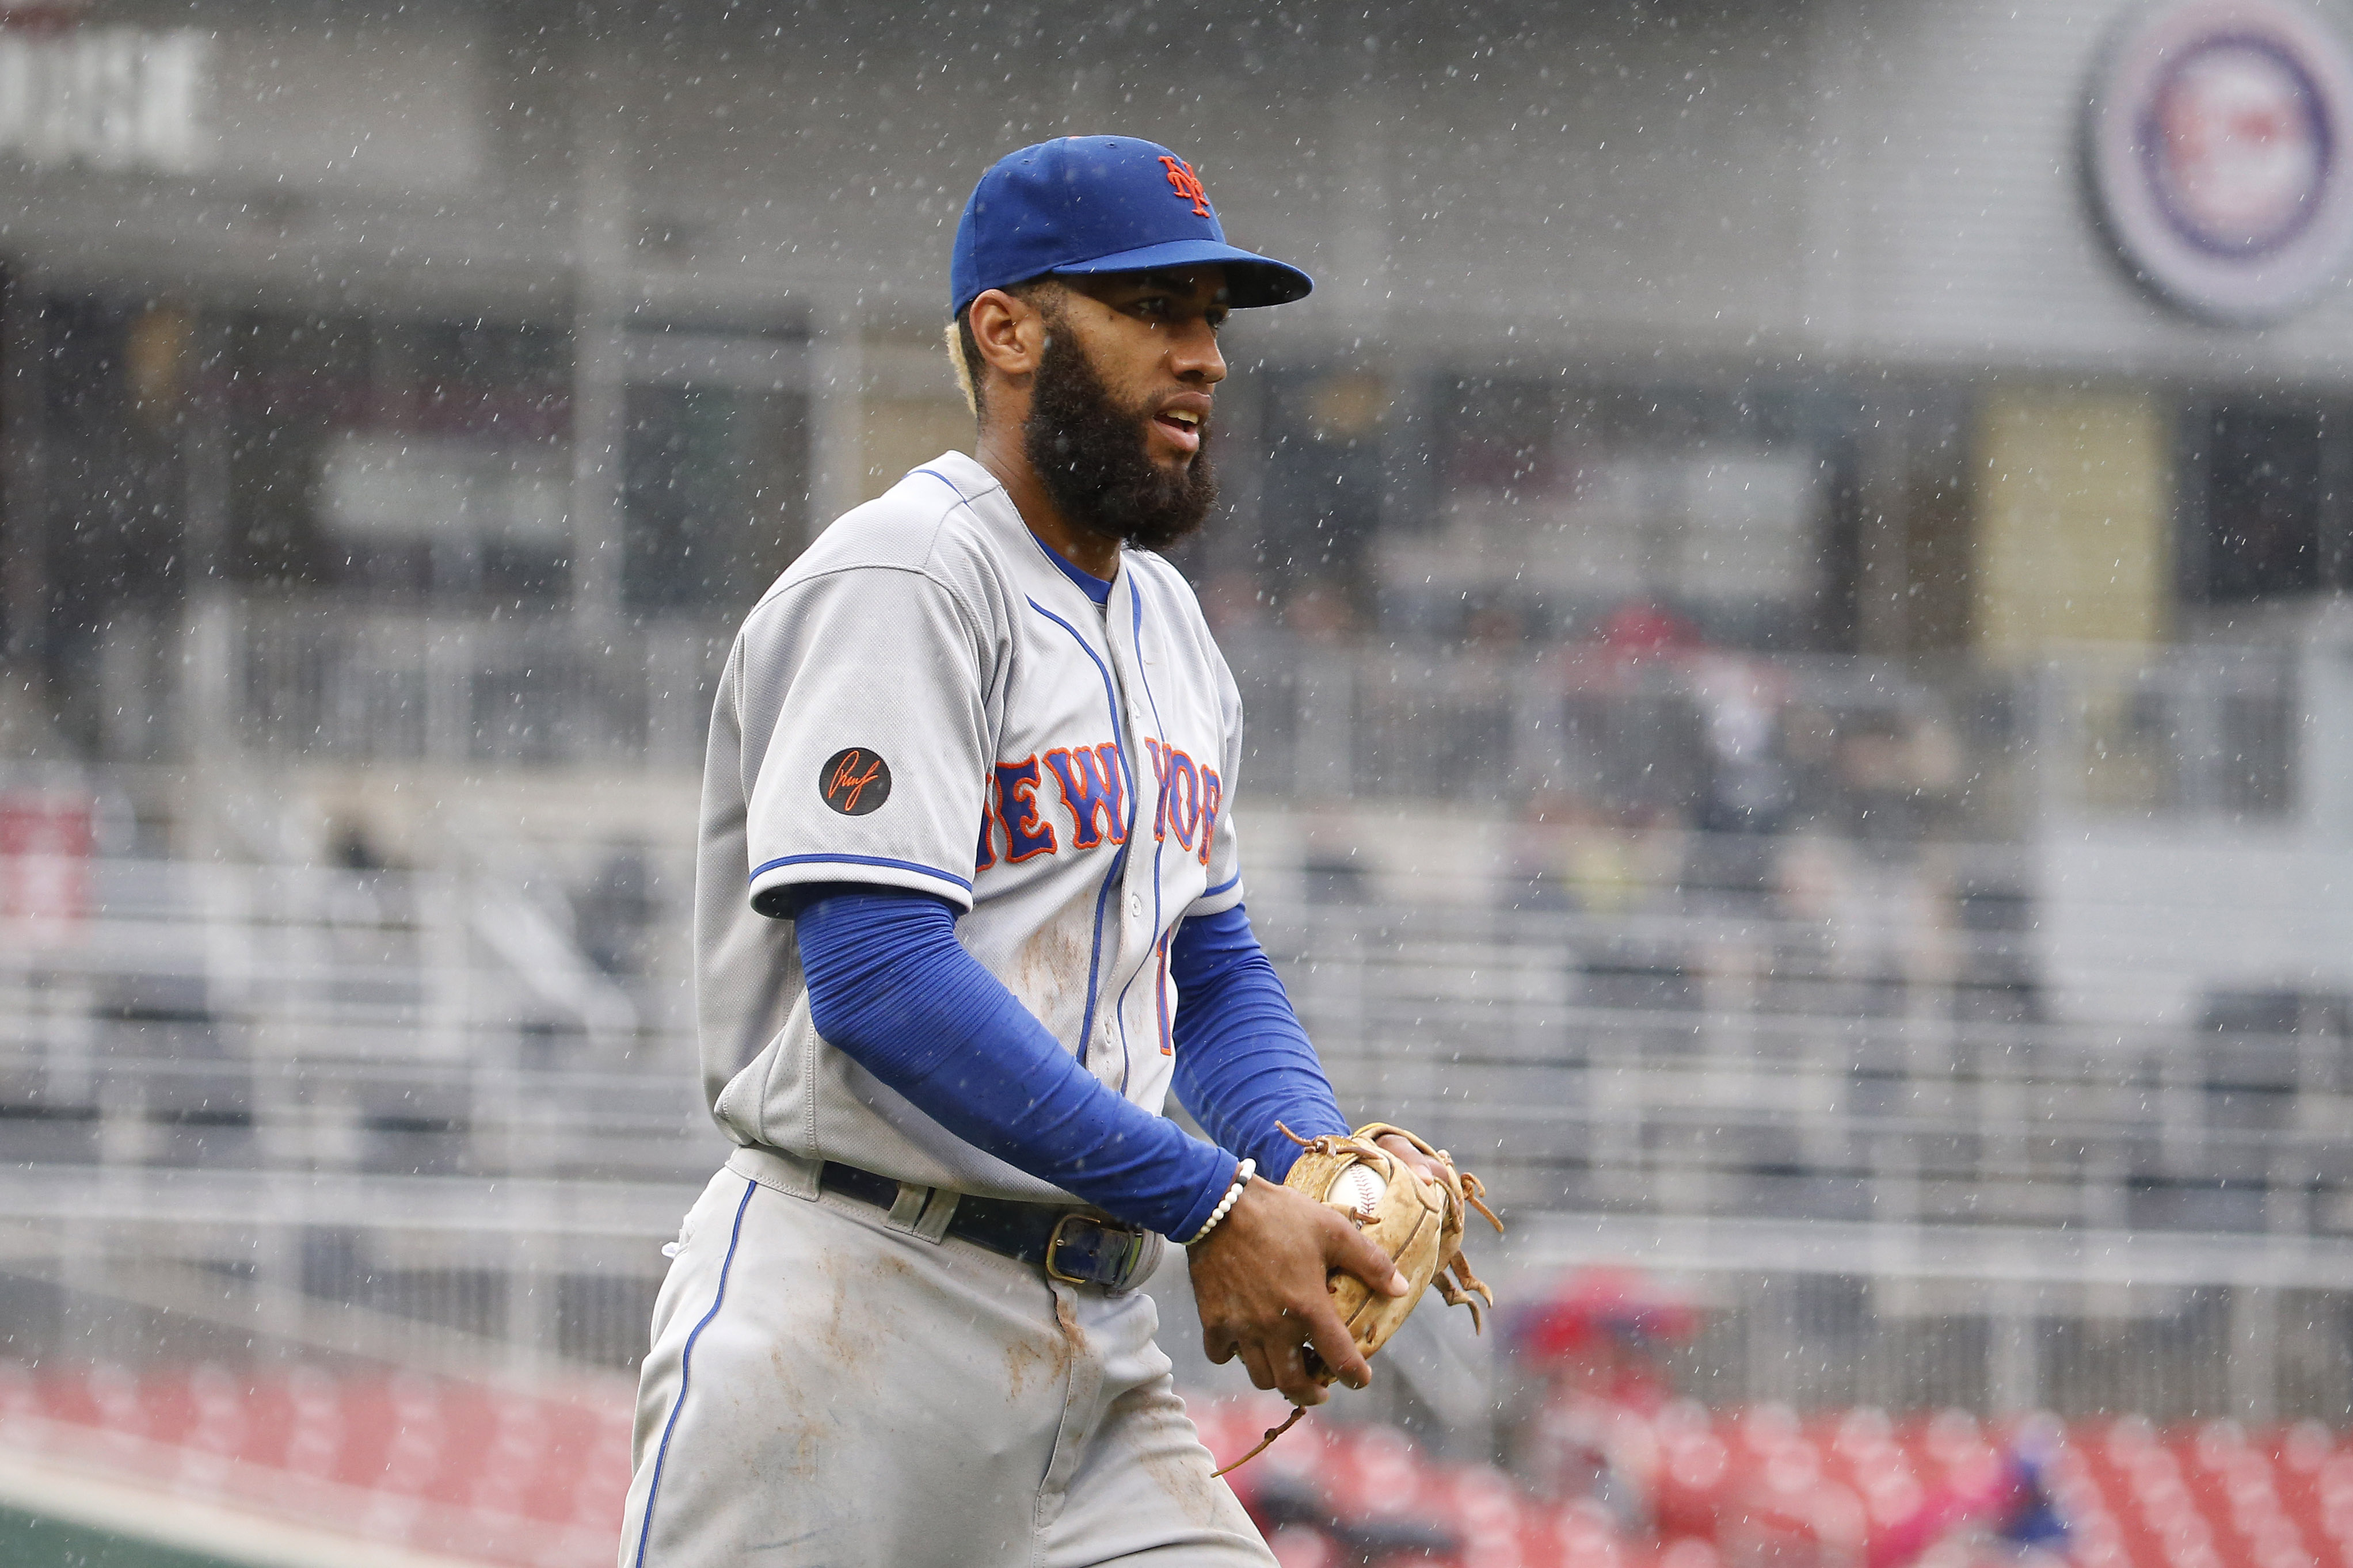 9/25/18 Game Preview: Atlanta Braves at New York Mets